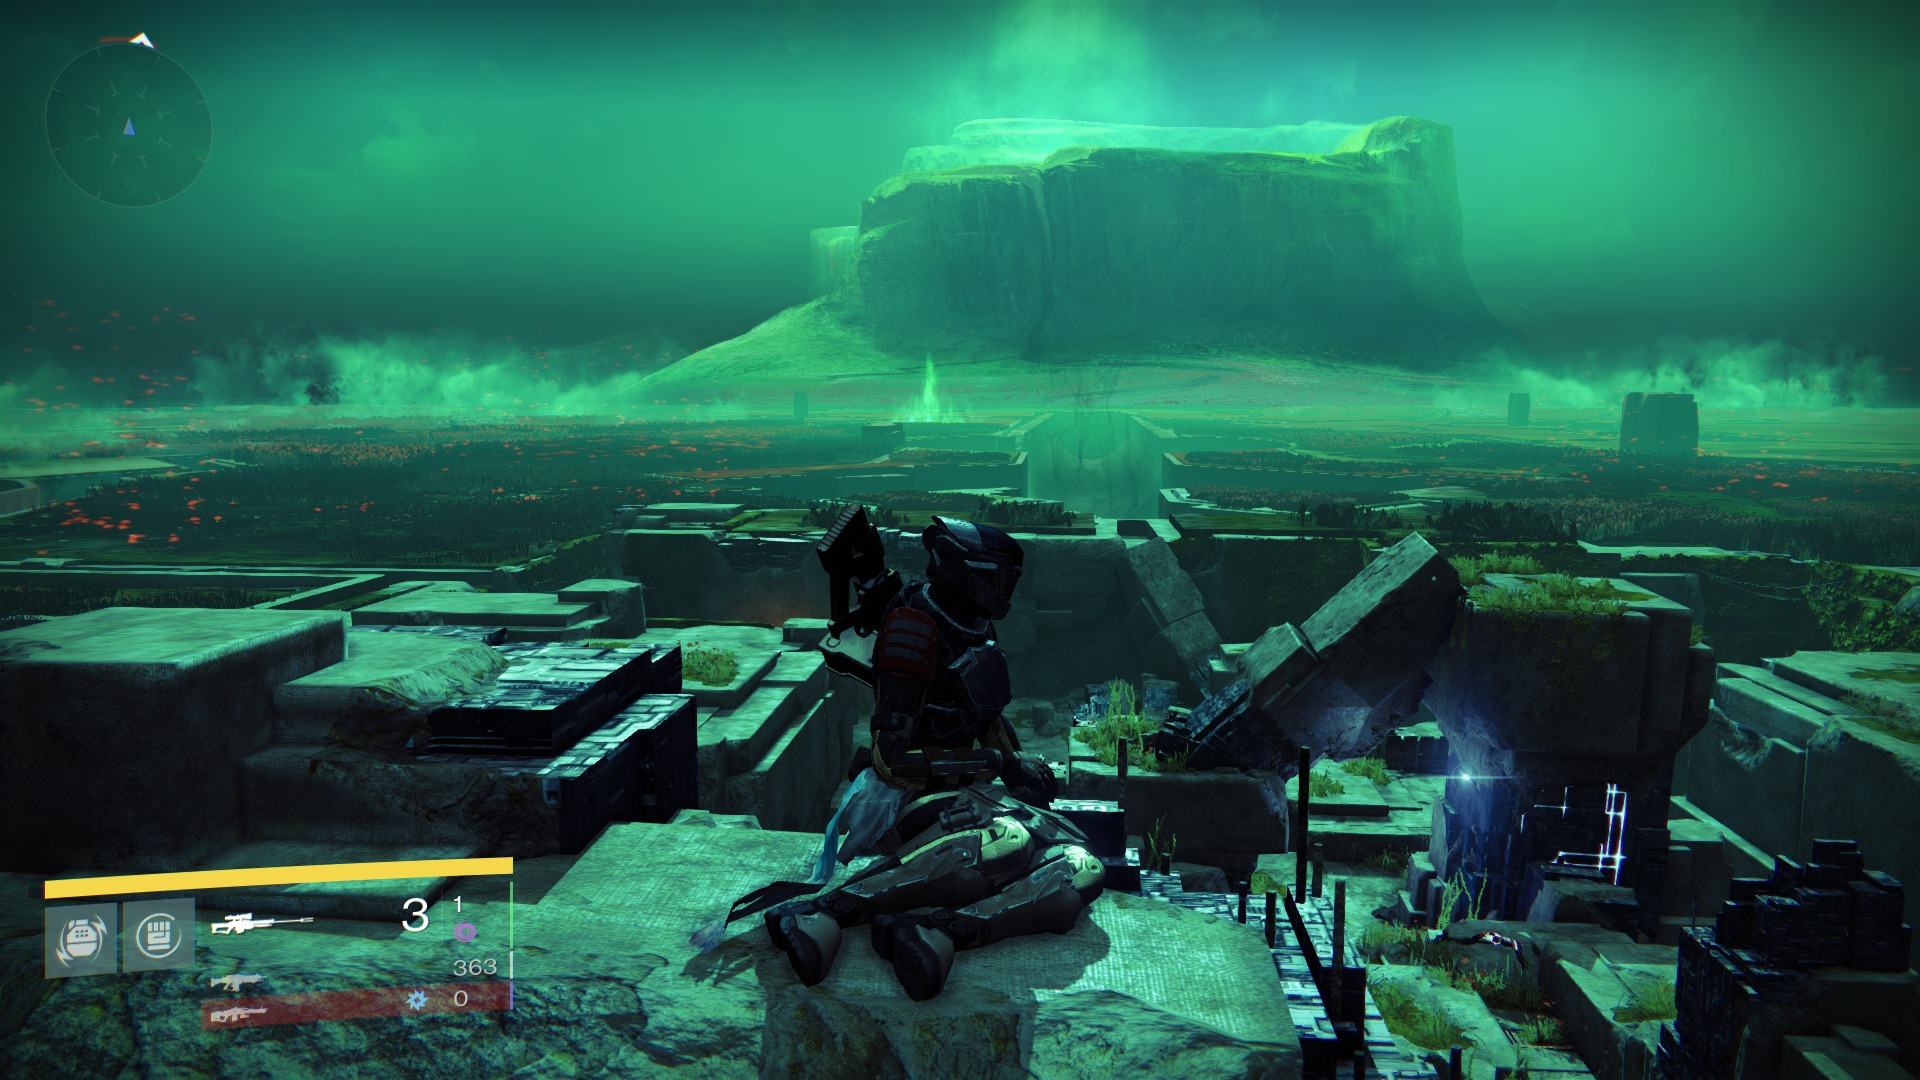 Photo of De ce povestea din Destiny este atat de slaba si incoerenta? Motivele incep sa iasa la lumina!